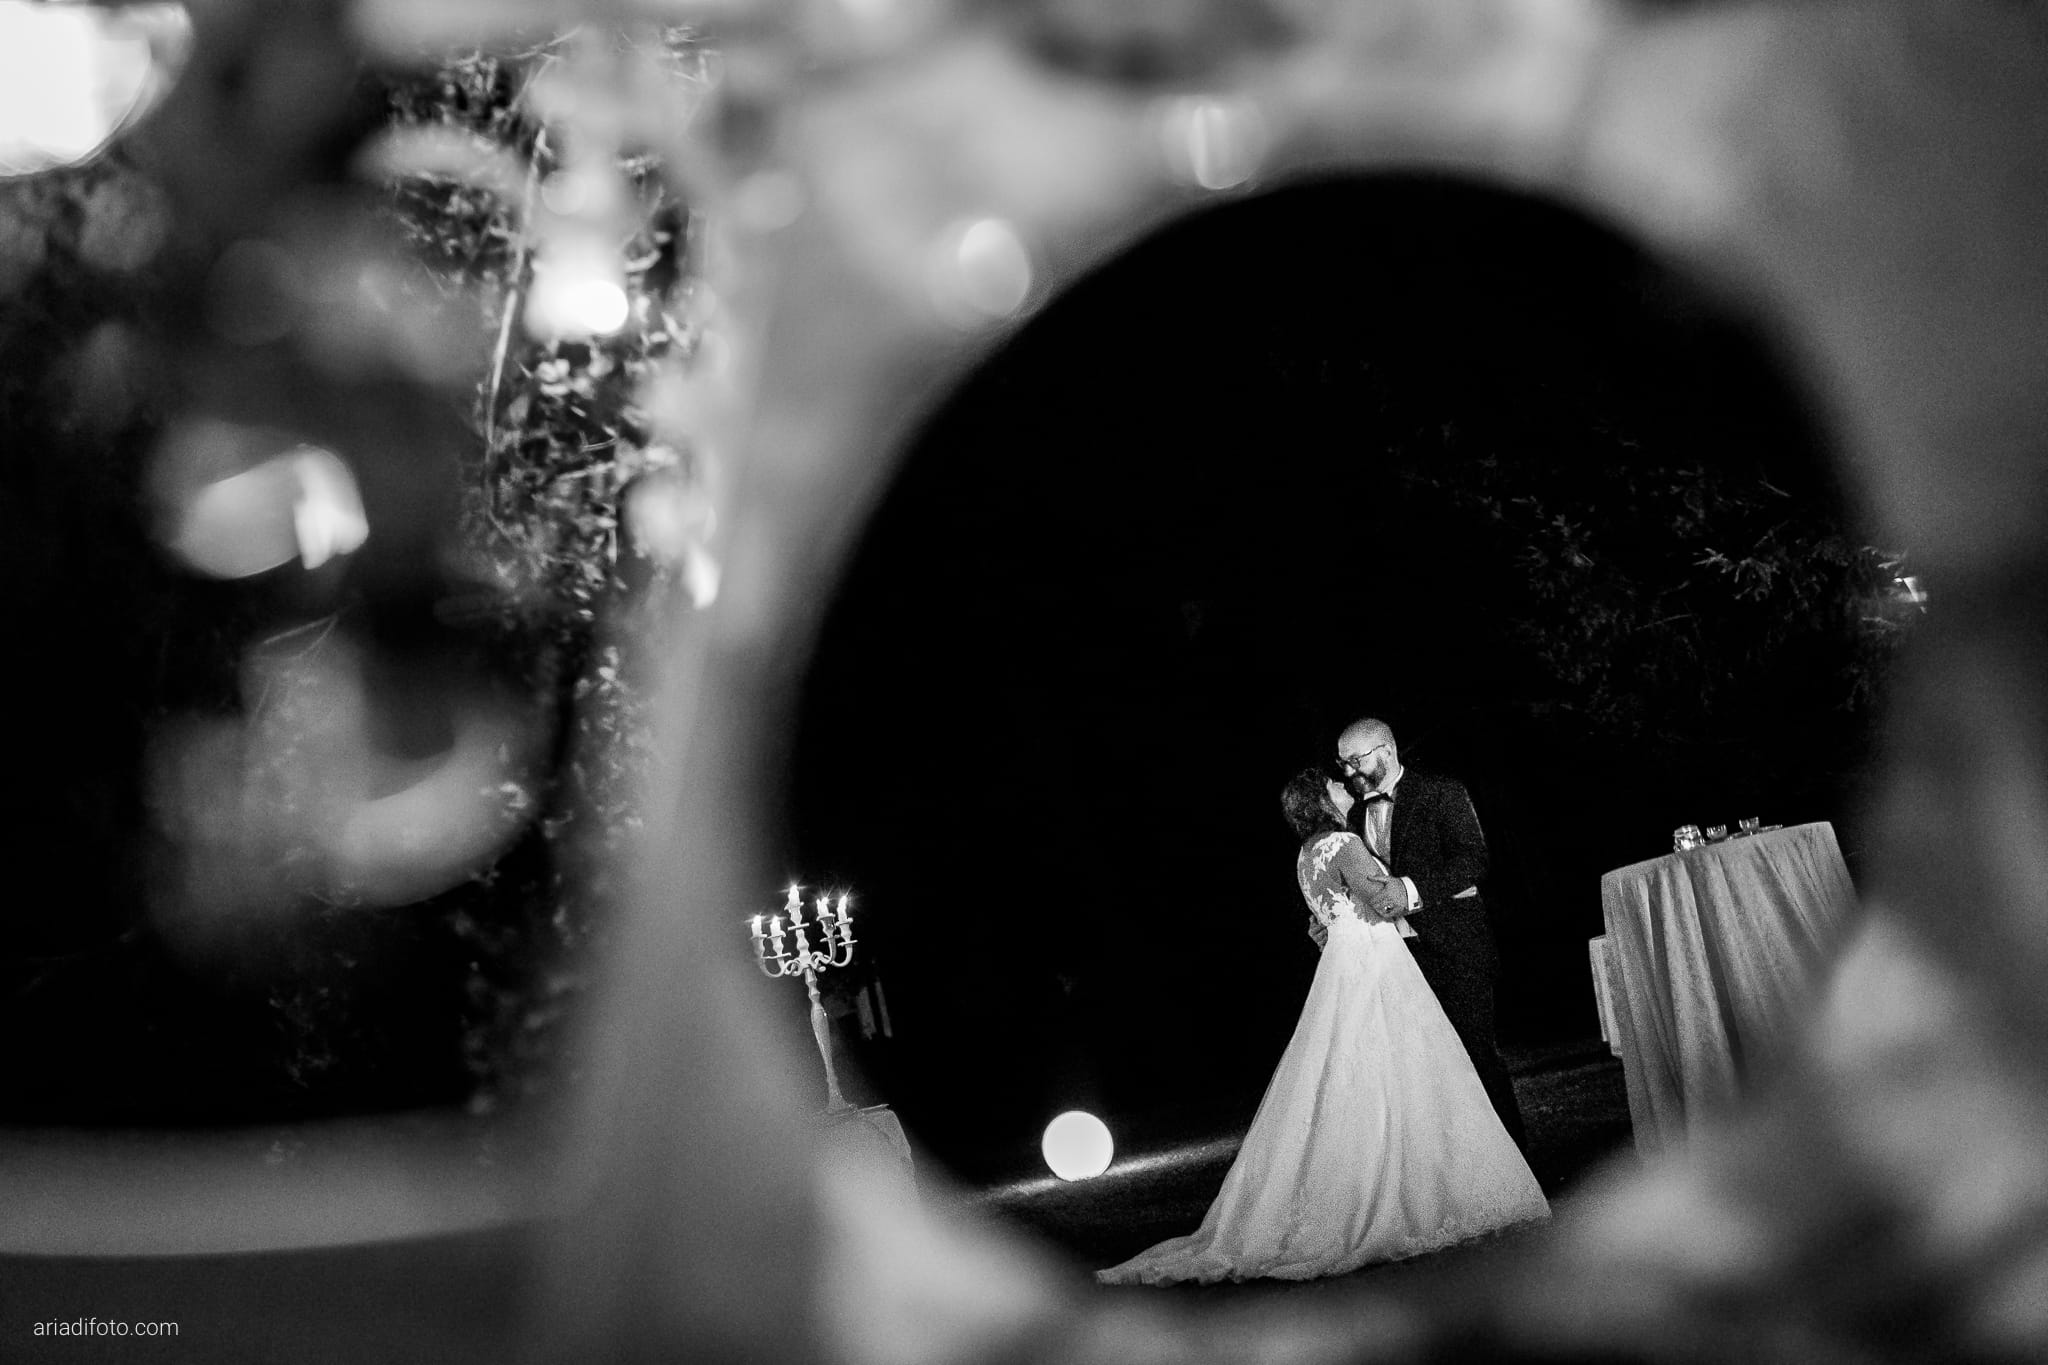 Lavinia Daniele Matrimonio Medea Gorizia Villa Elodia Trivignano Udinese Udine ritratti sposi notturni